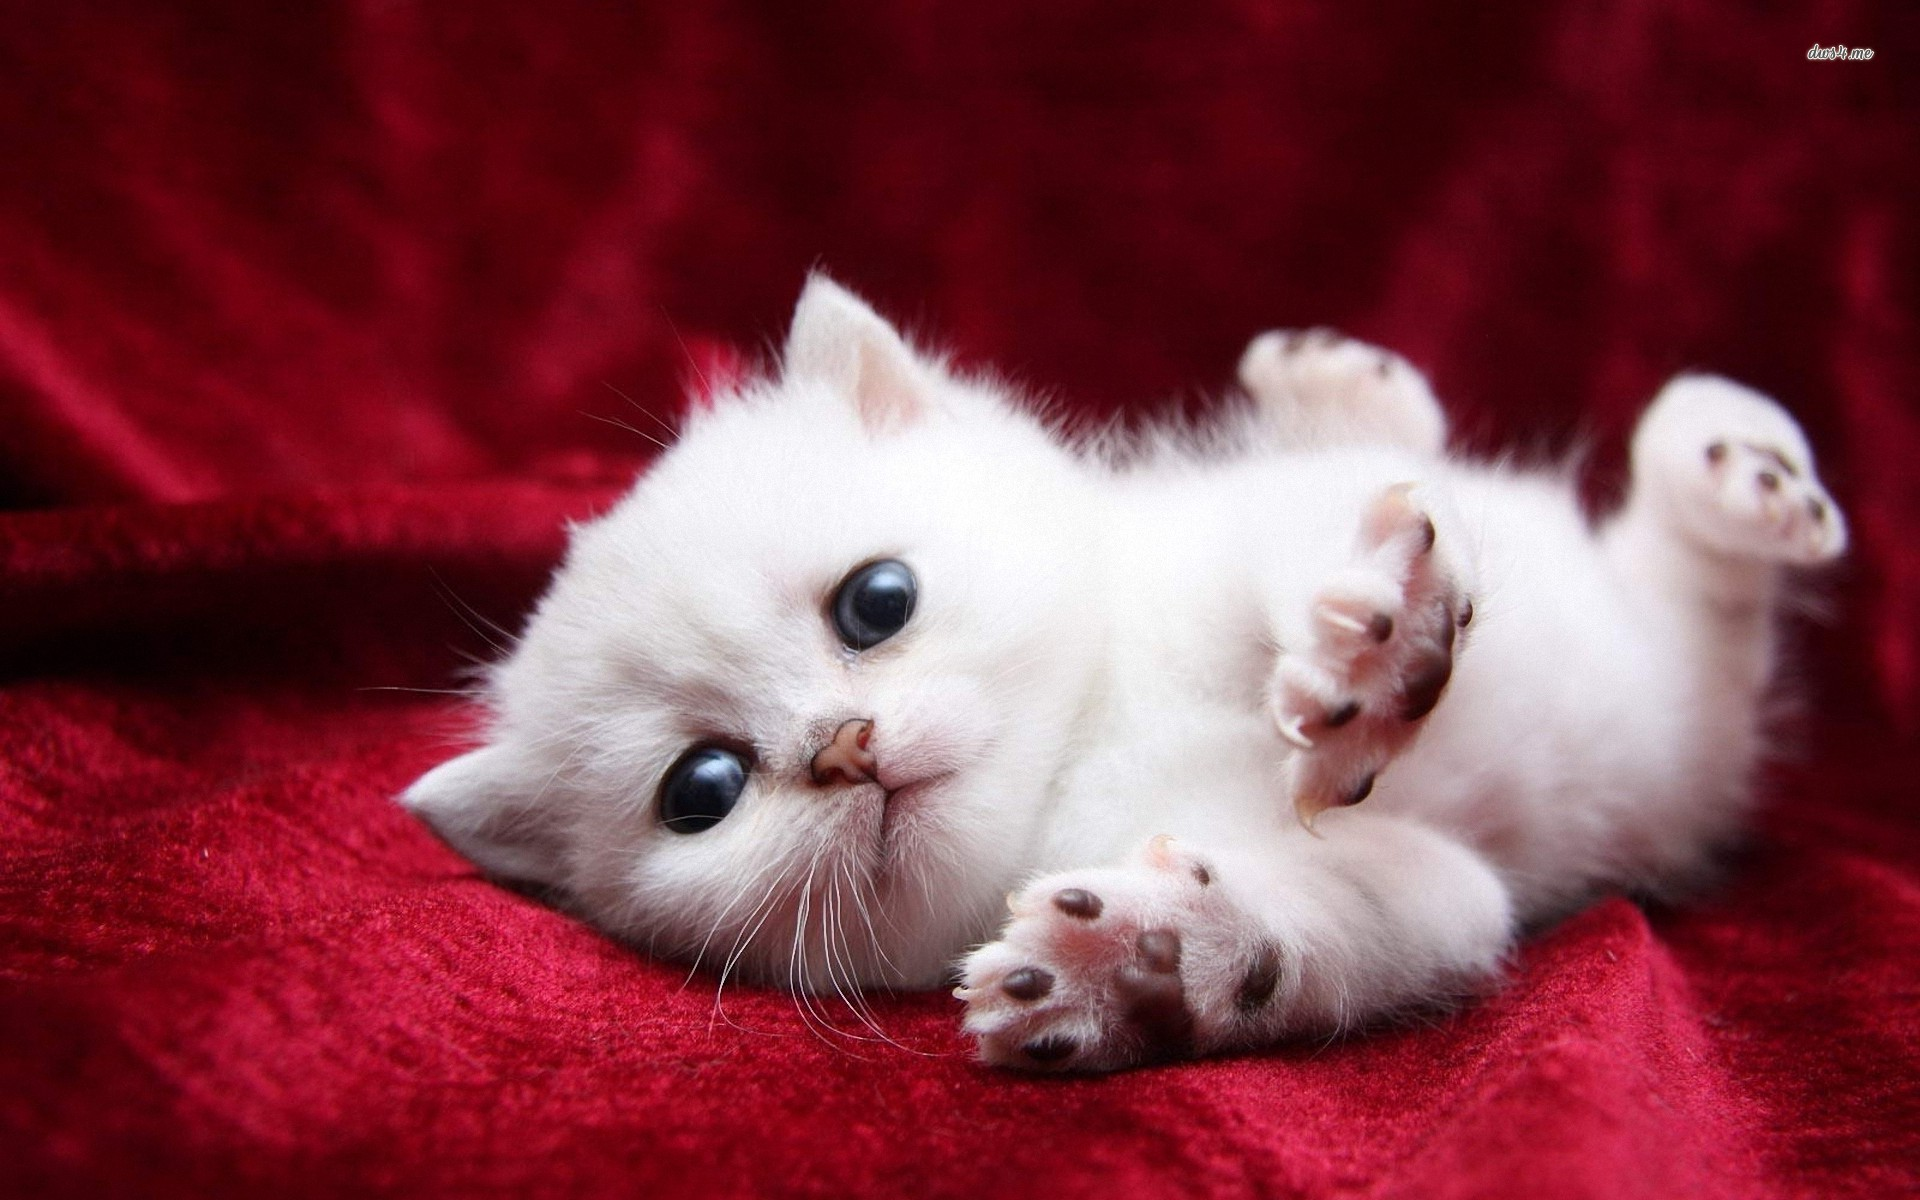 Cute Cats and Kittens Wallpaper - WallpaperSafari